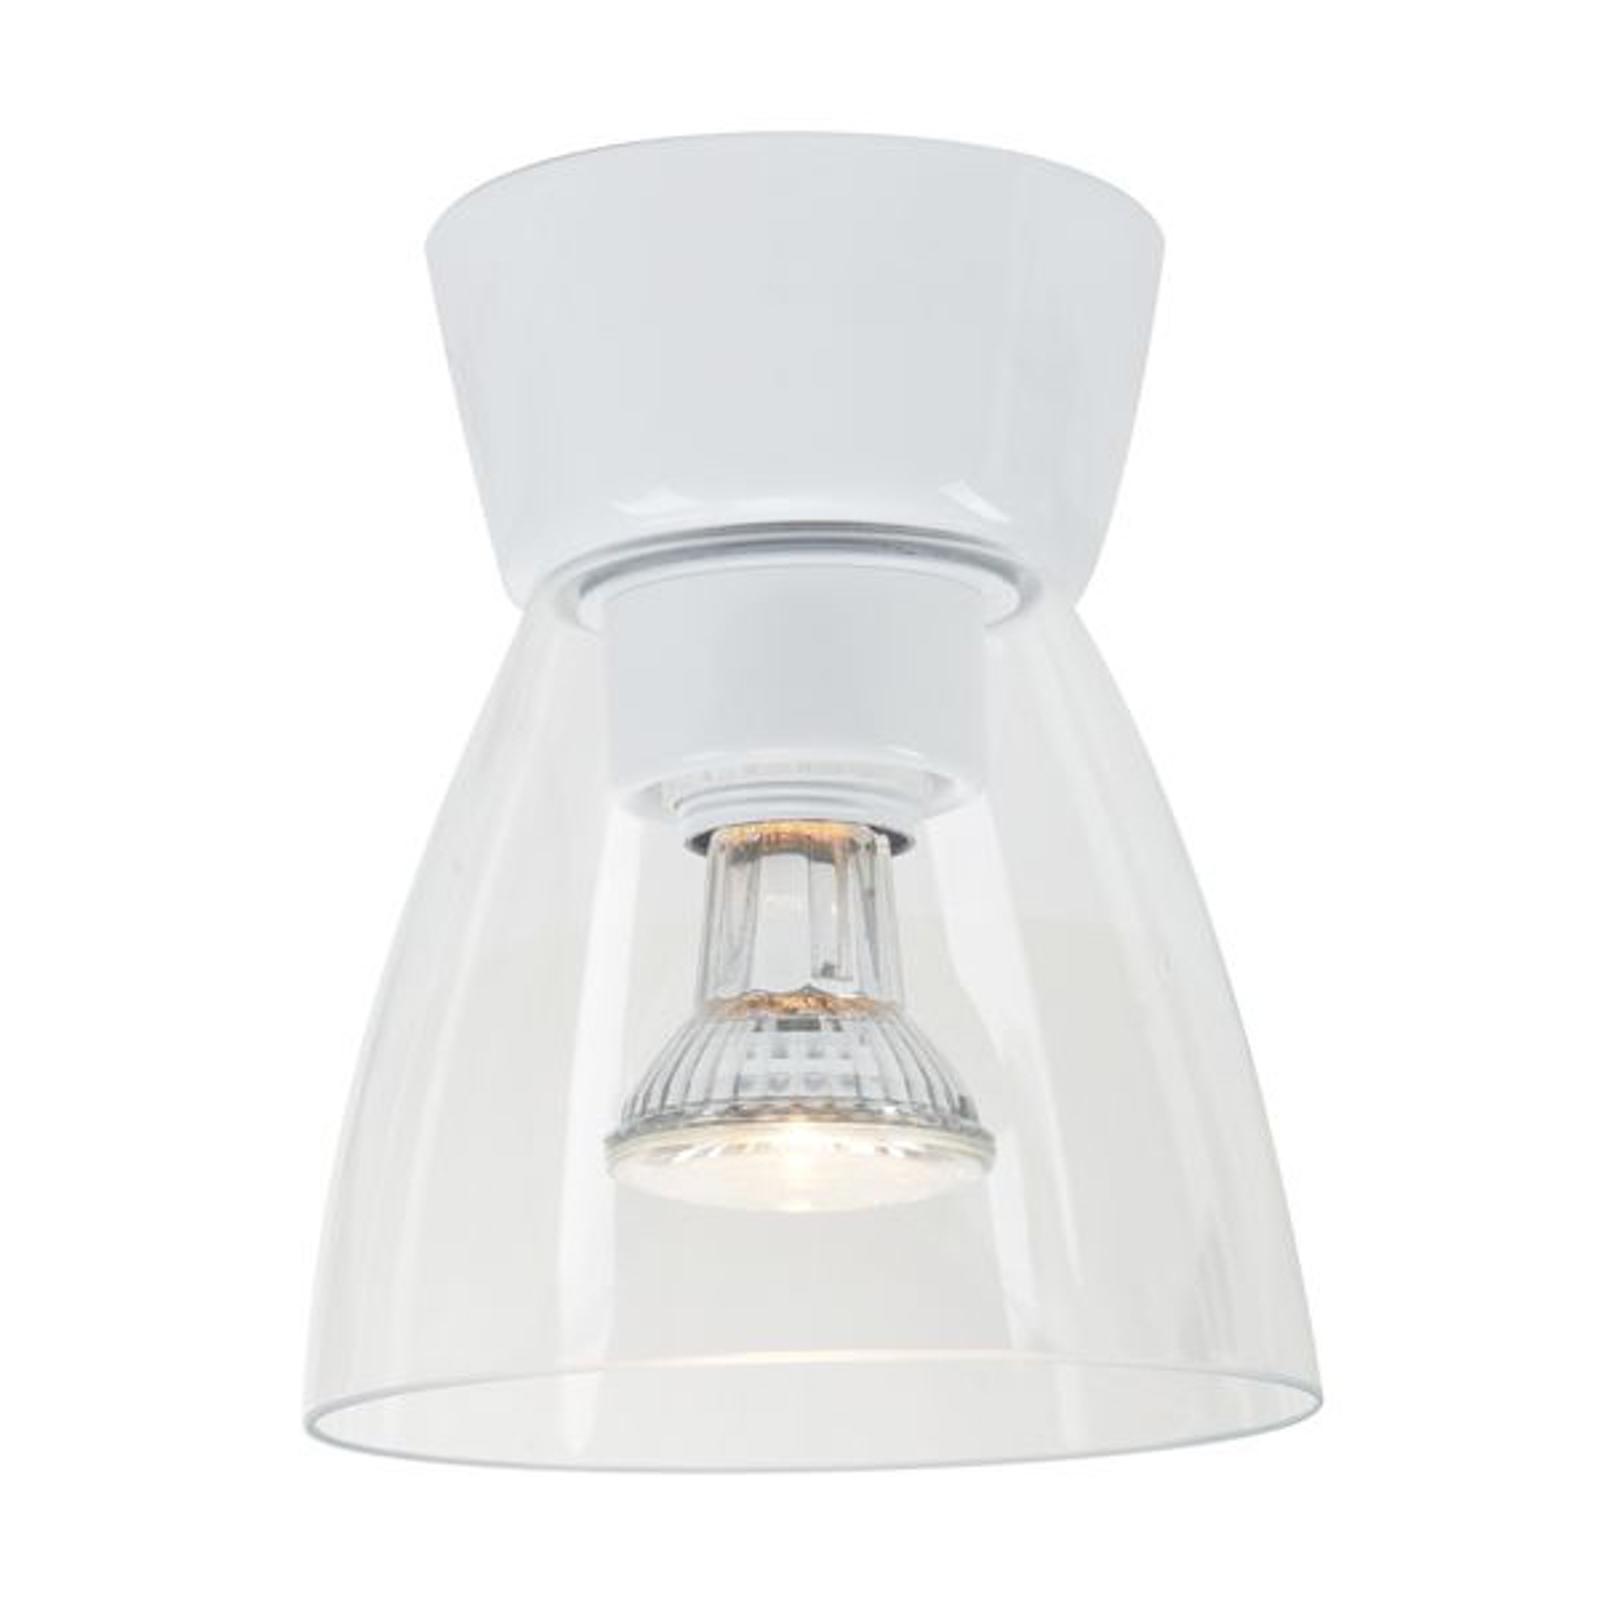 LED plafondlamp Bizzo baldakijn wit helder glas